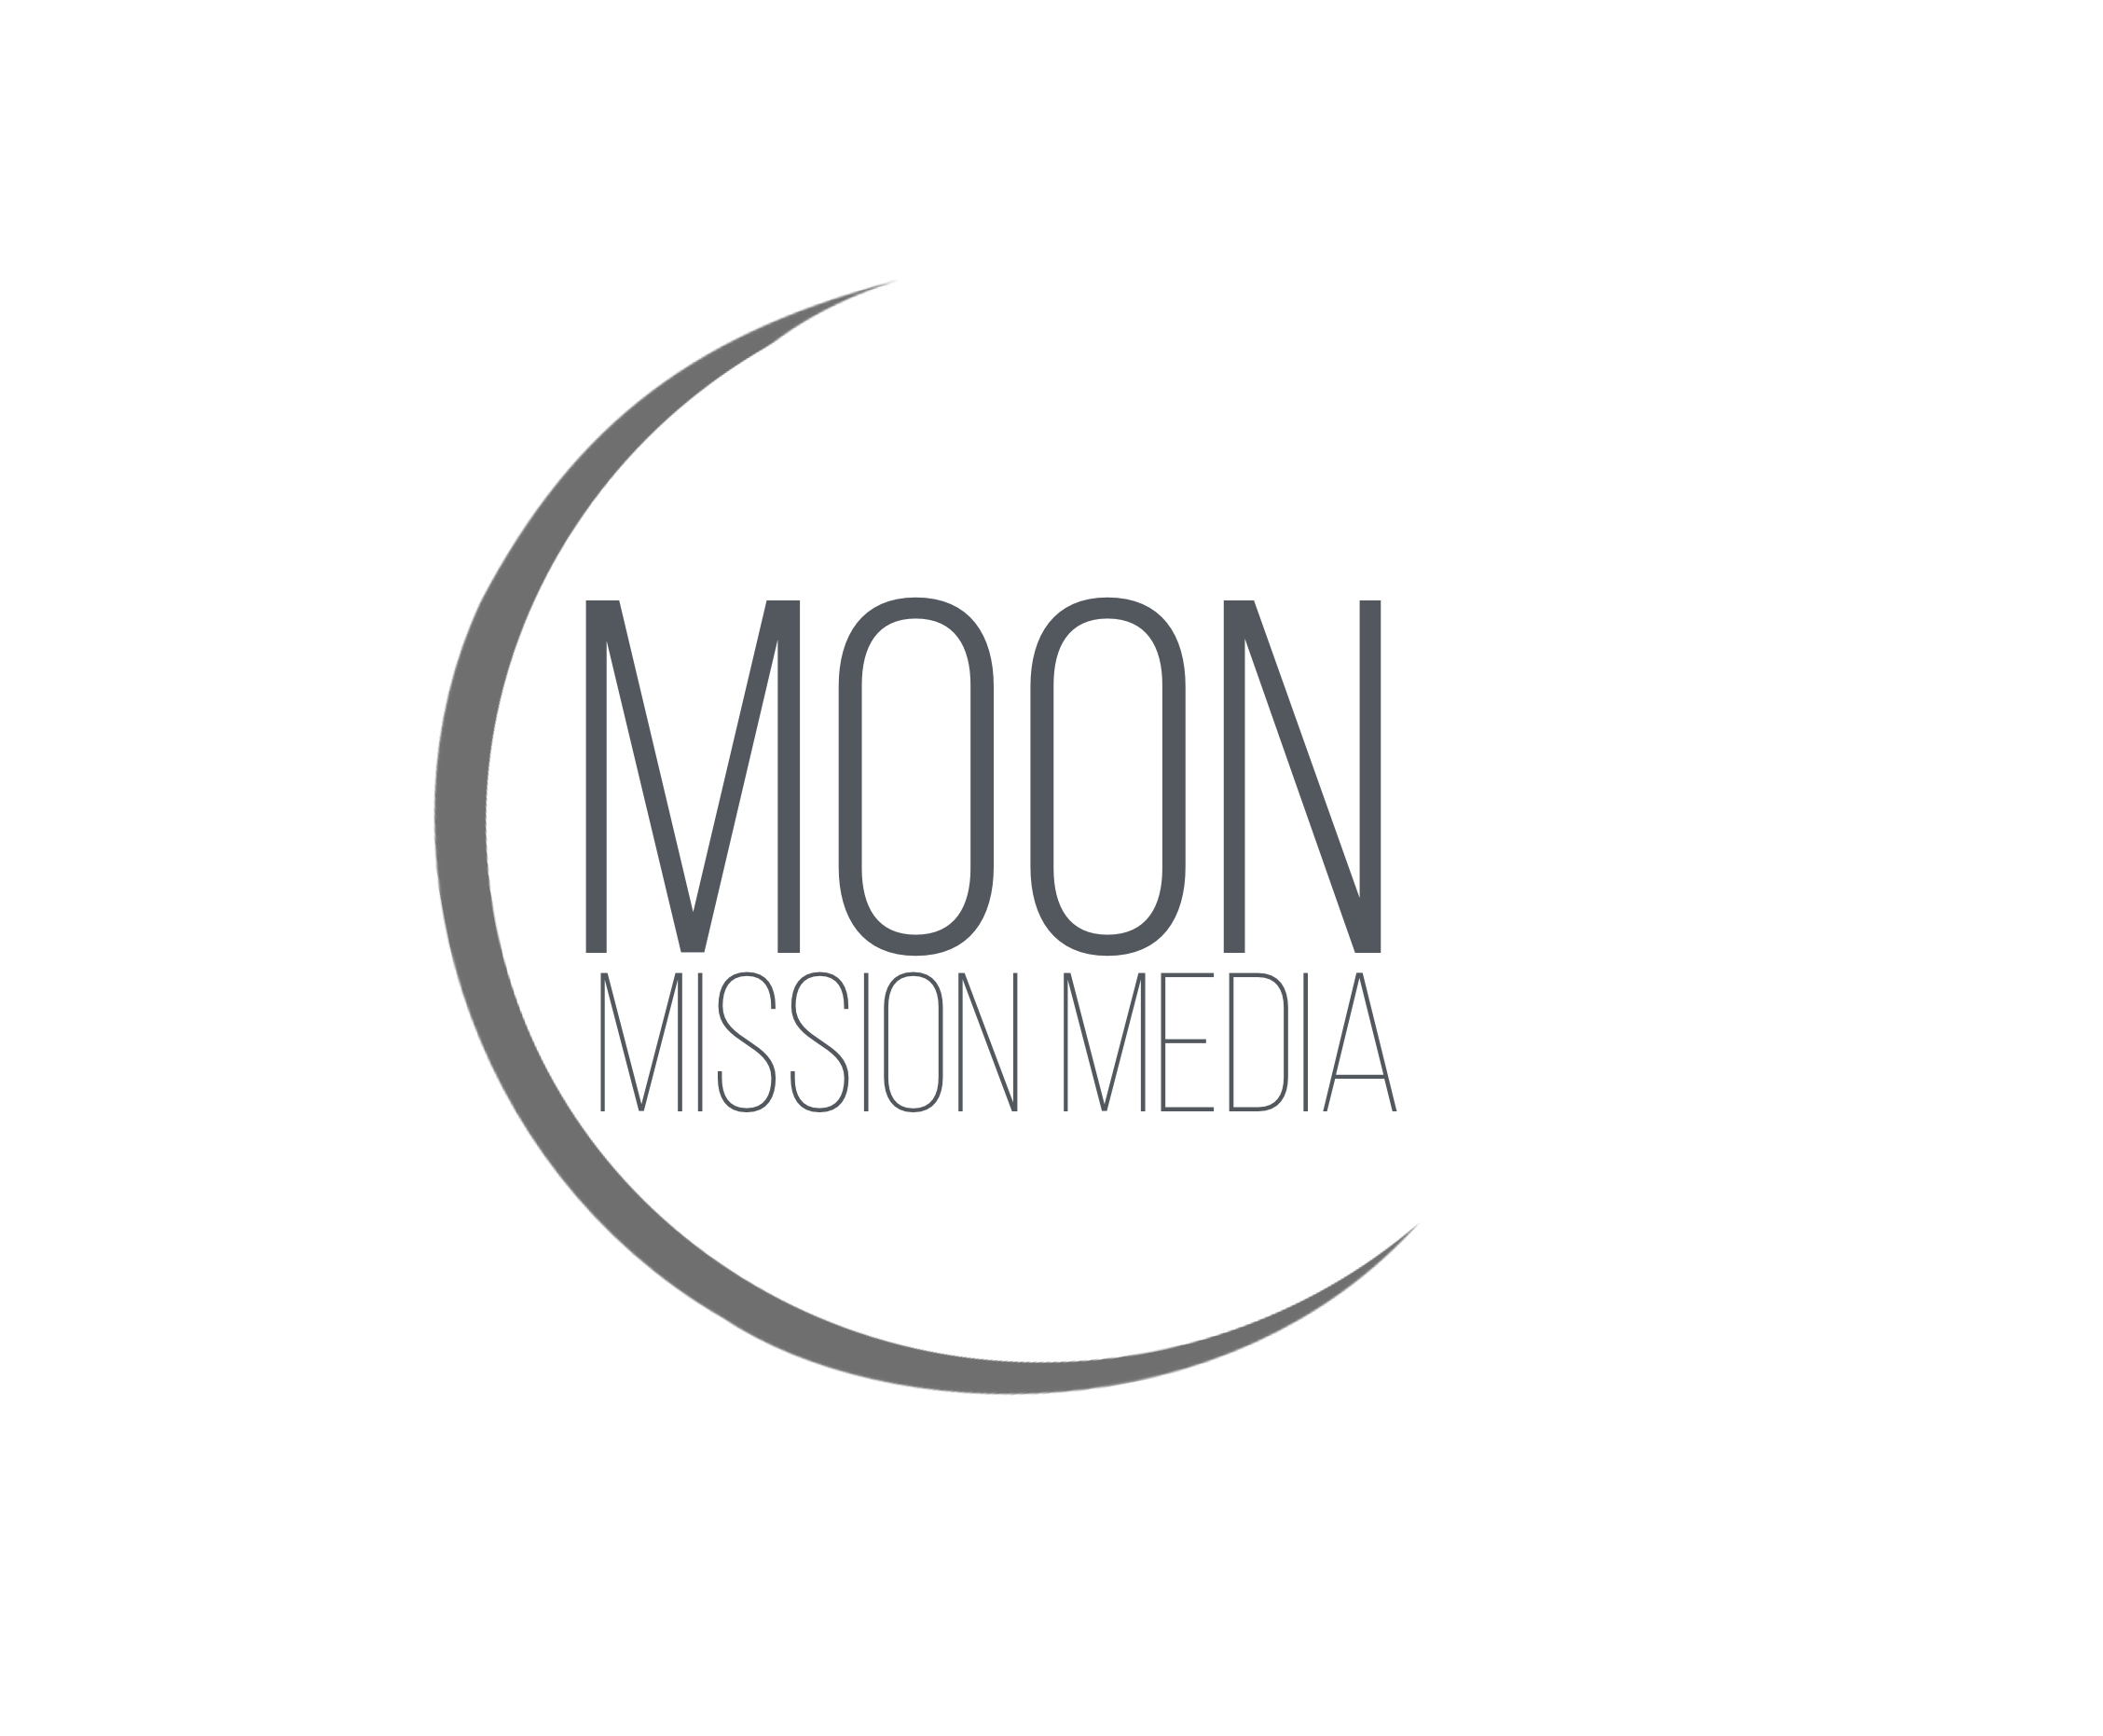 Moon mission media logo.png